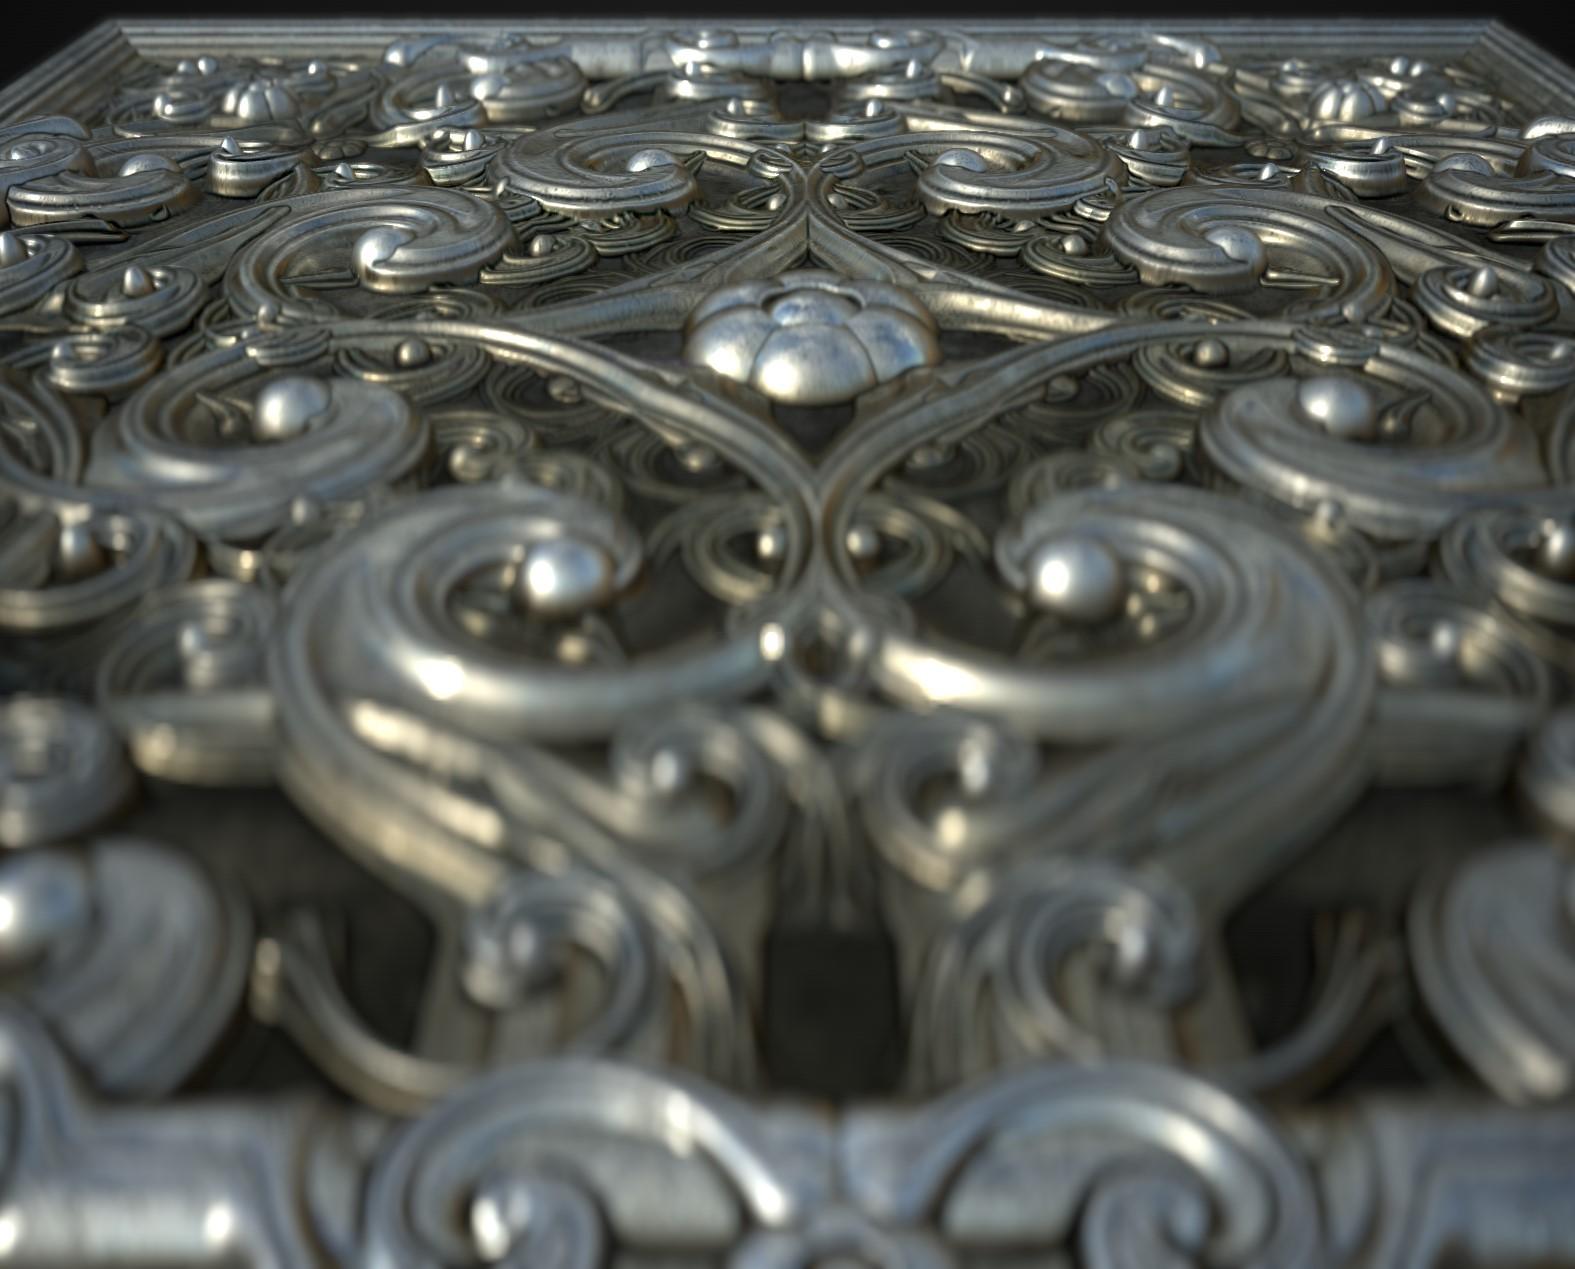 Close Up details